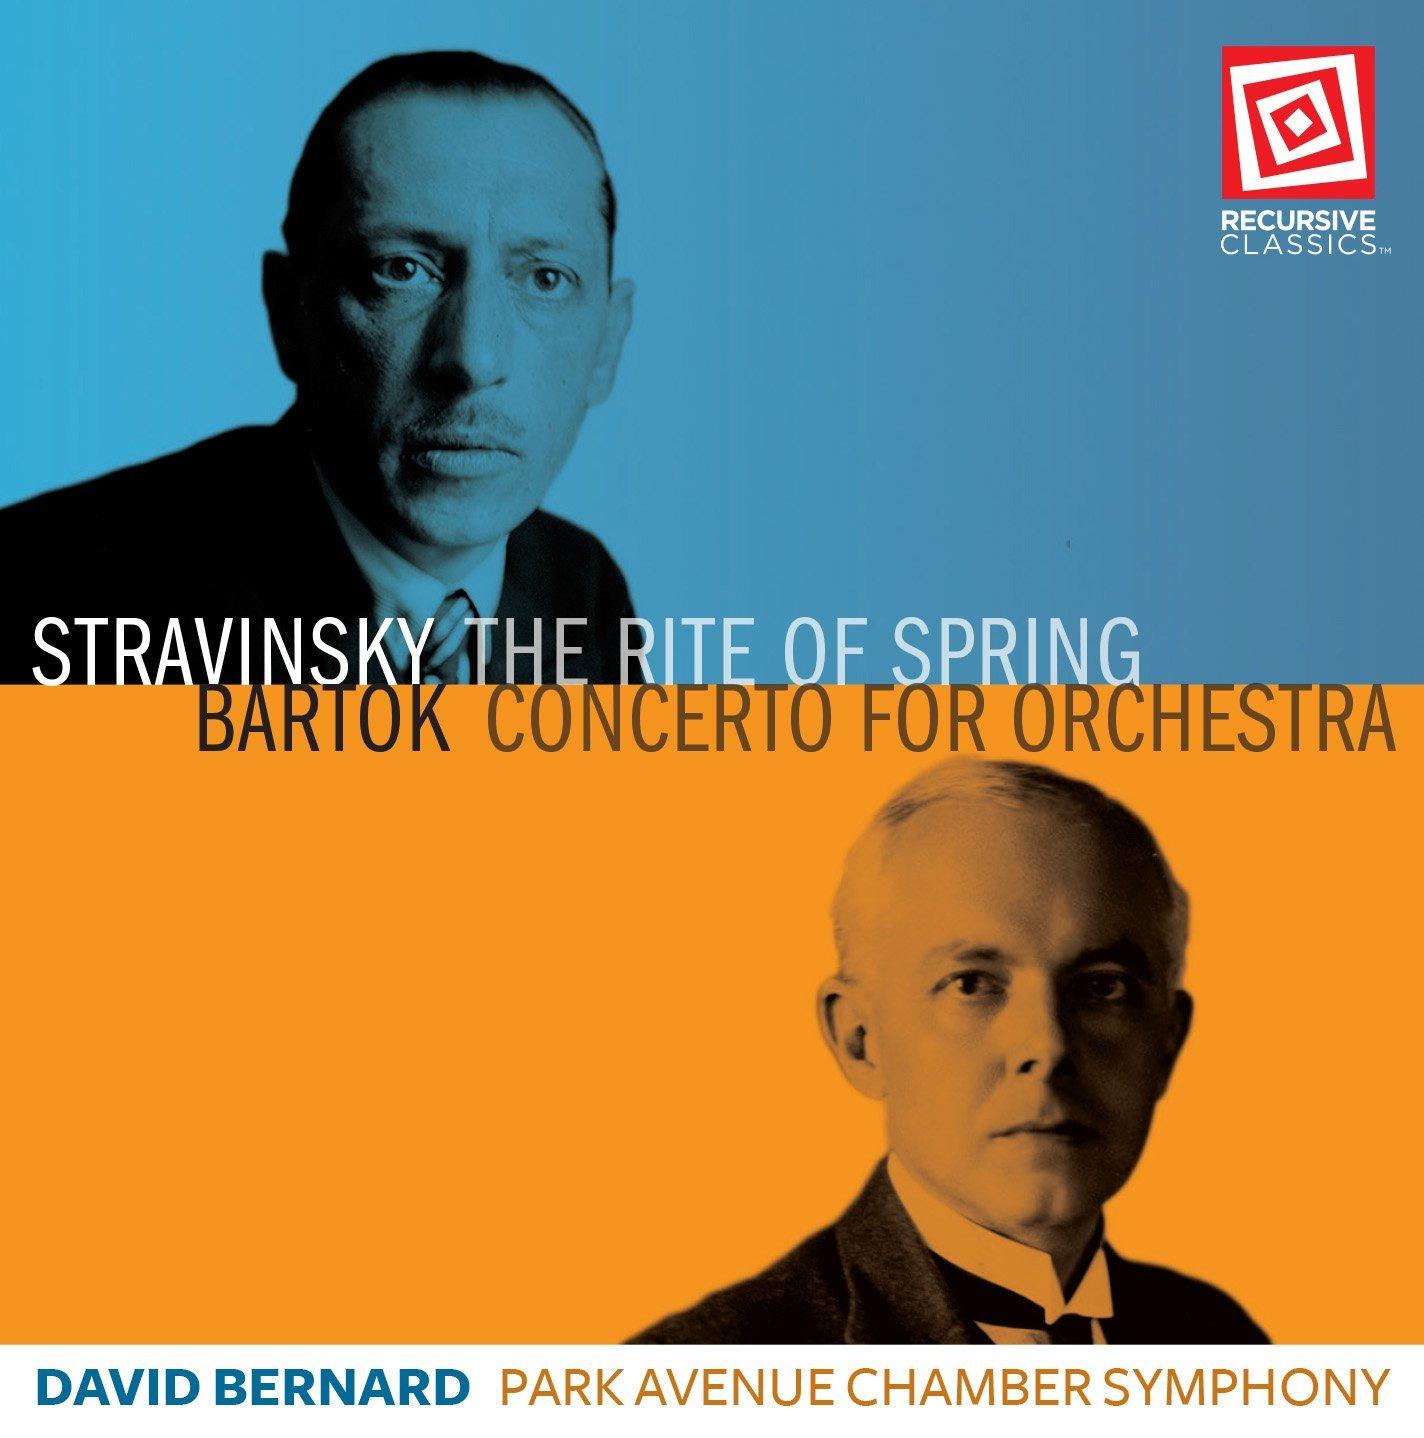 Park Avenue Chamber Symphony Igor Stravinsky Bla Brtok David Bernard